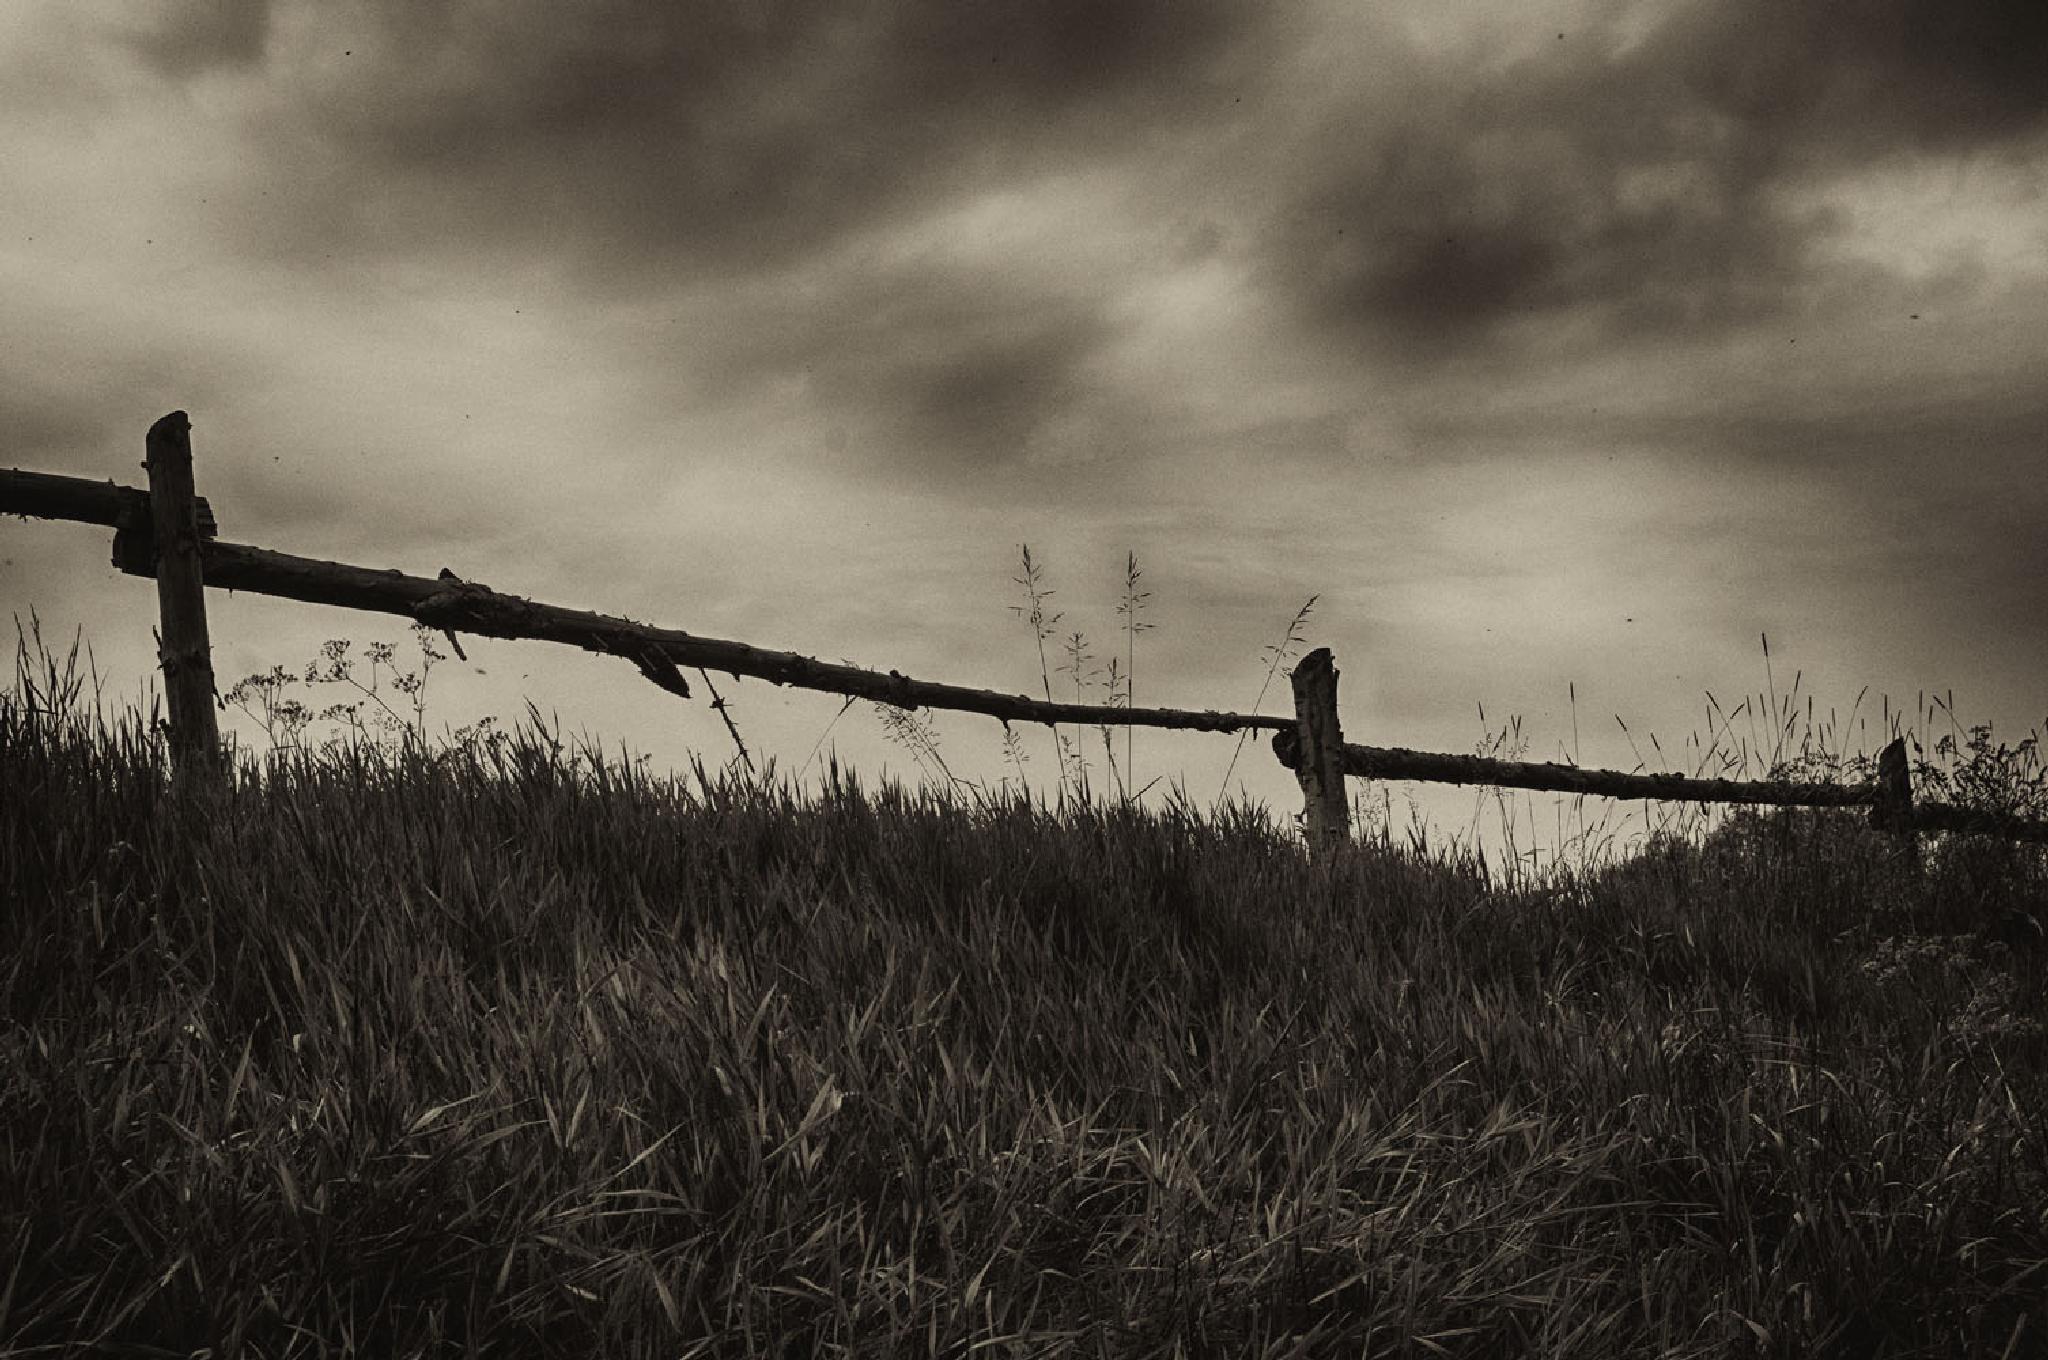 Untitled by k.demjanic photography